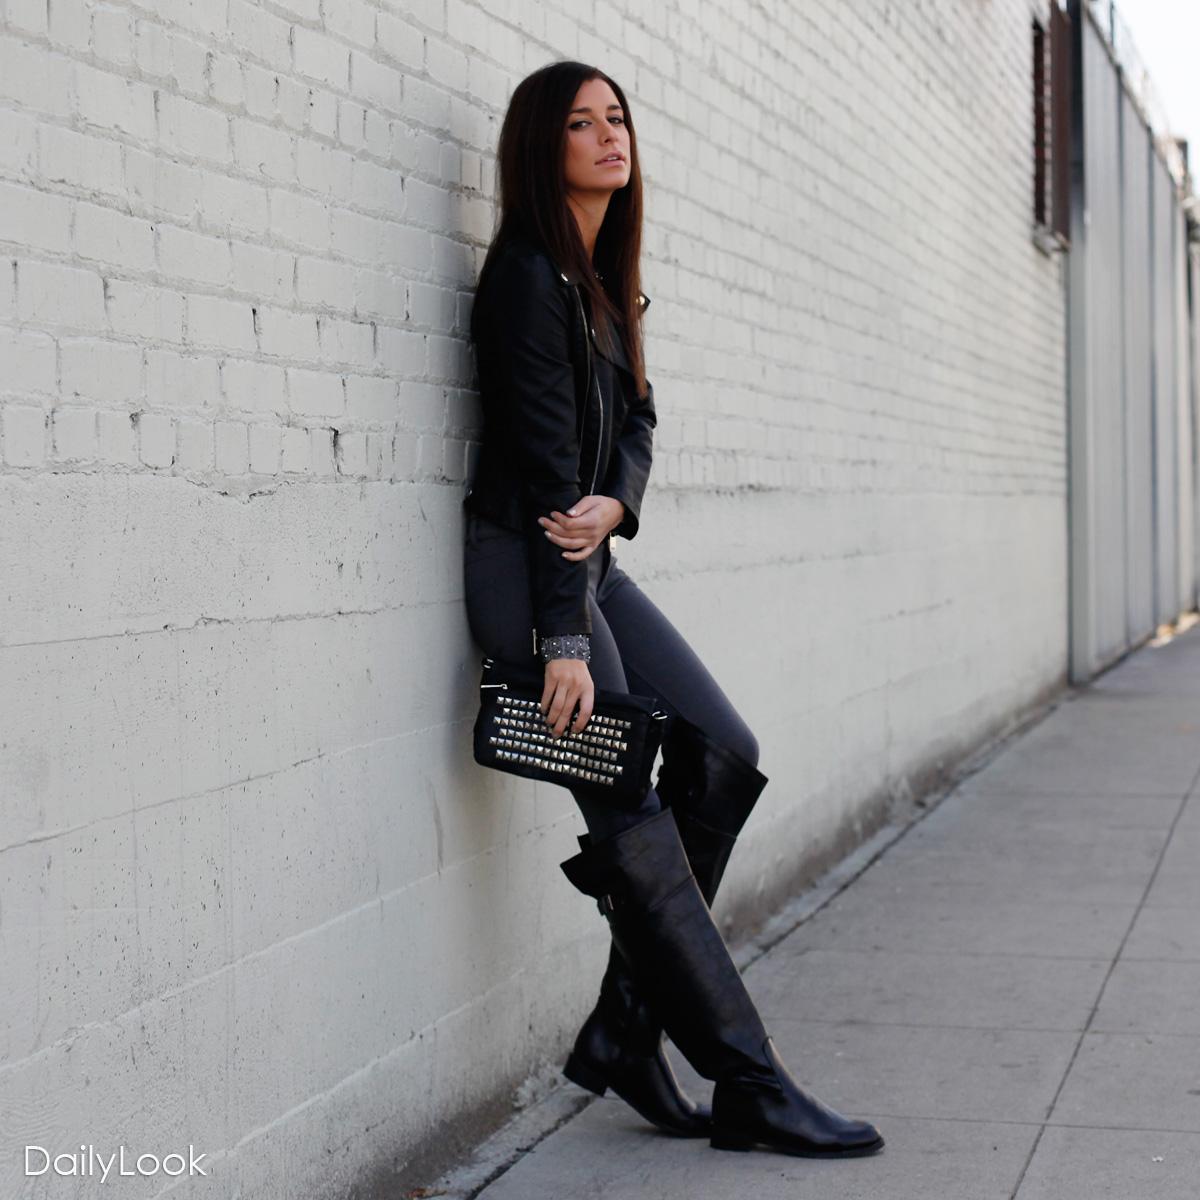 glam rock chic look dailylook. Black Bedroom Furniture Sets. Home Design Ideas